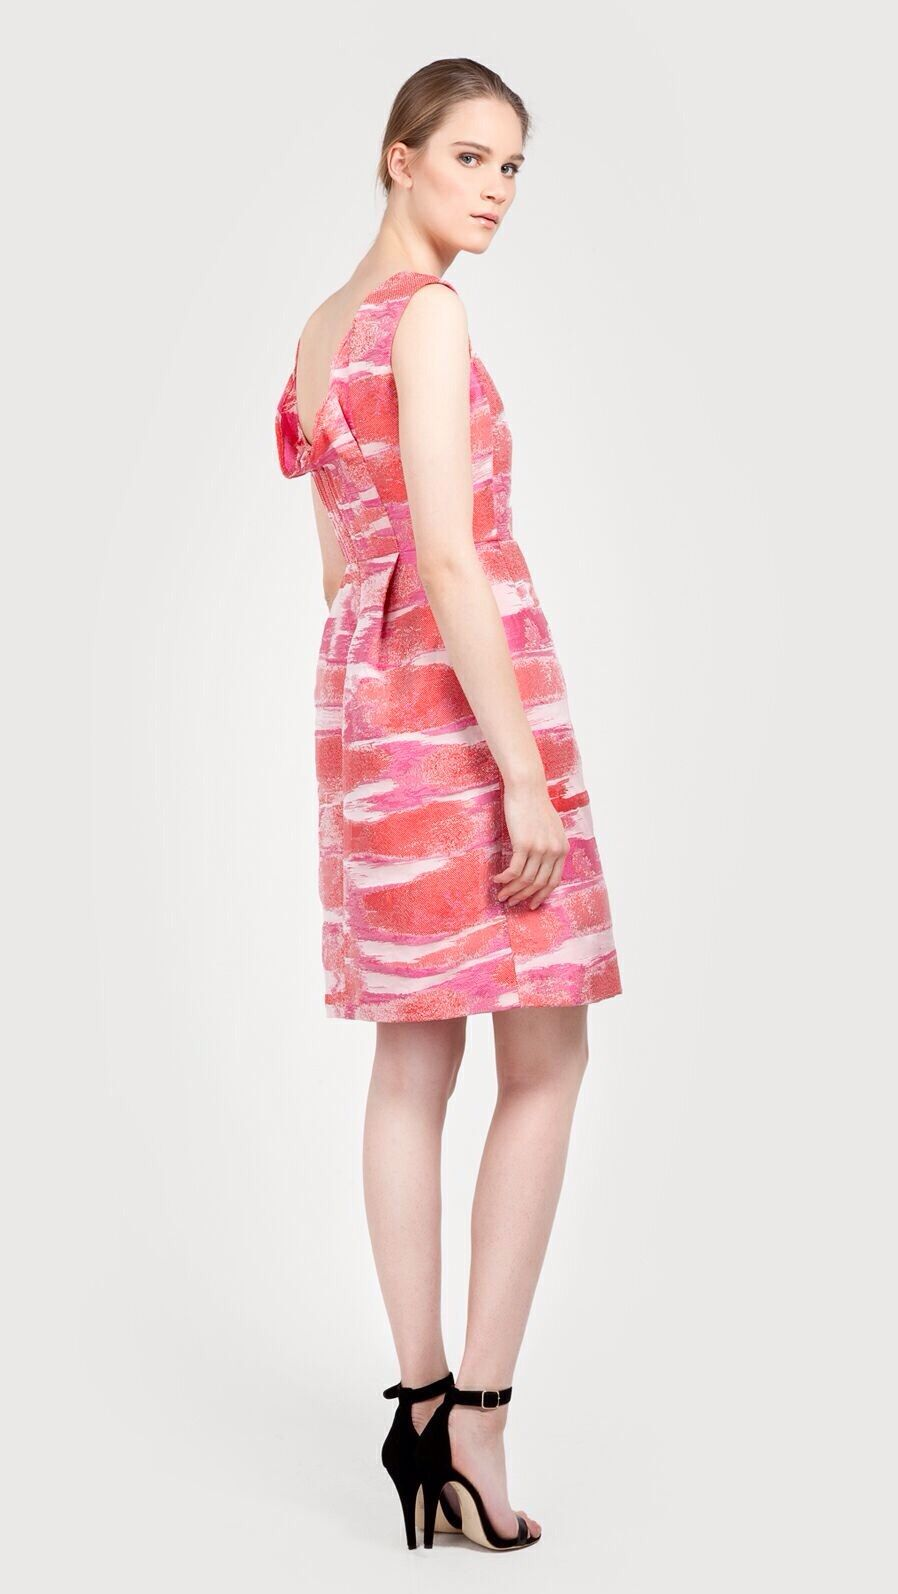 Vestido detalle plisado | Purificación Garcia | Pinterest | Fashion